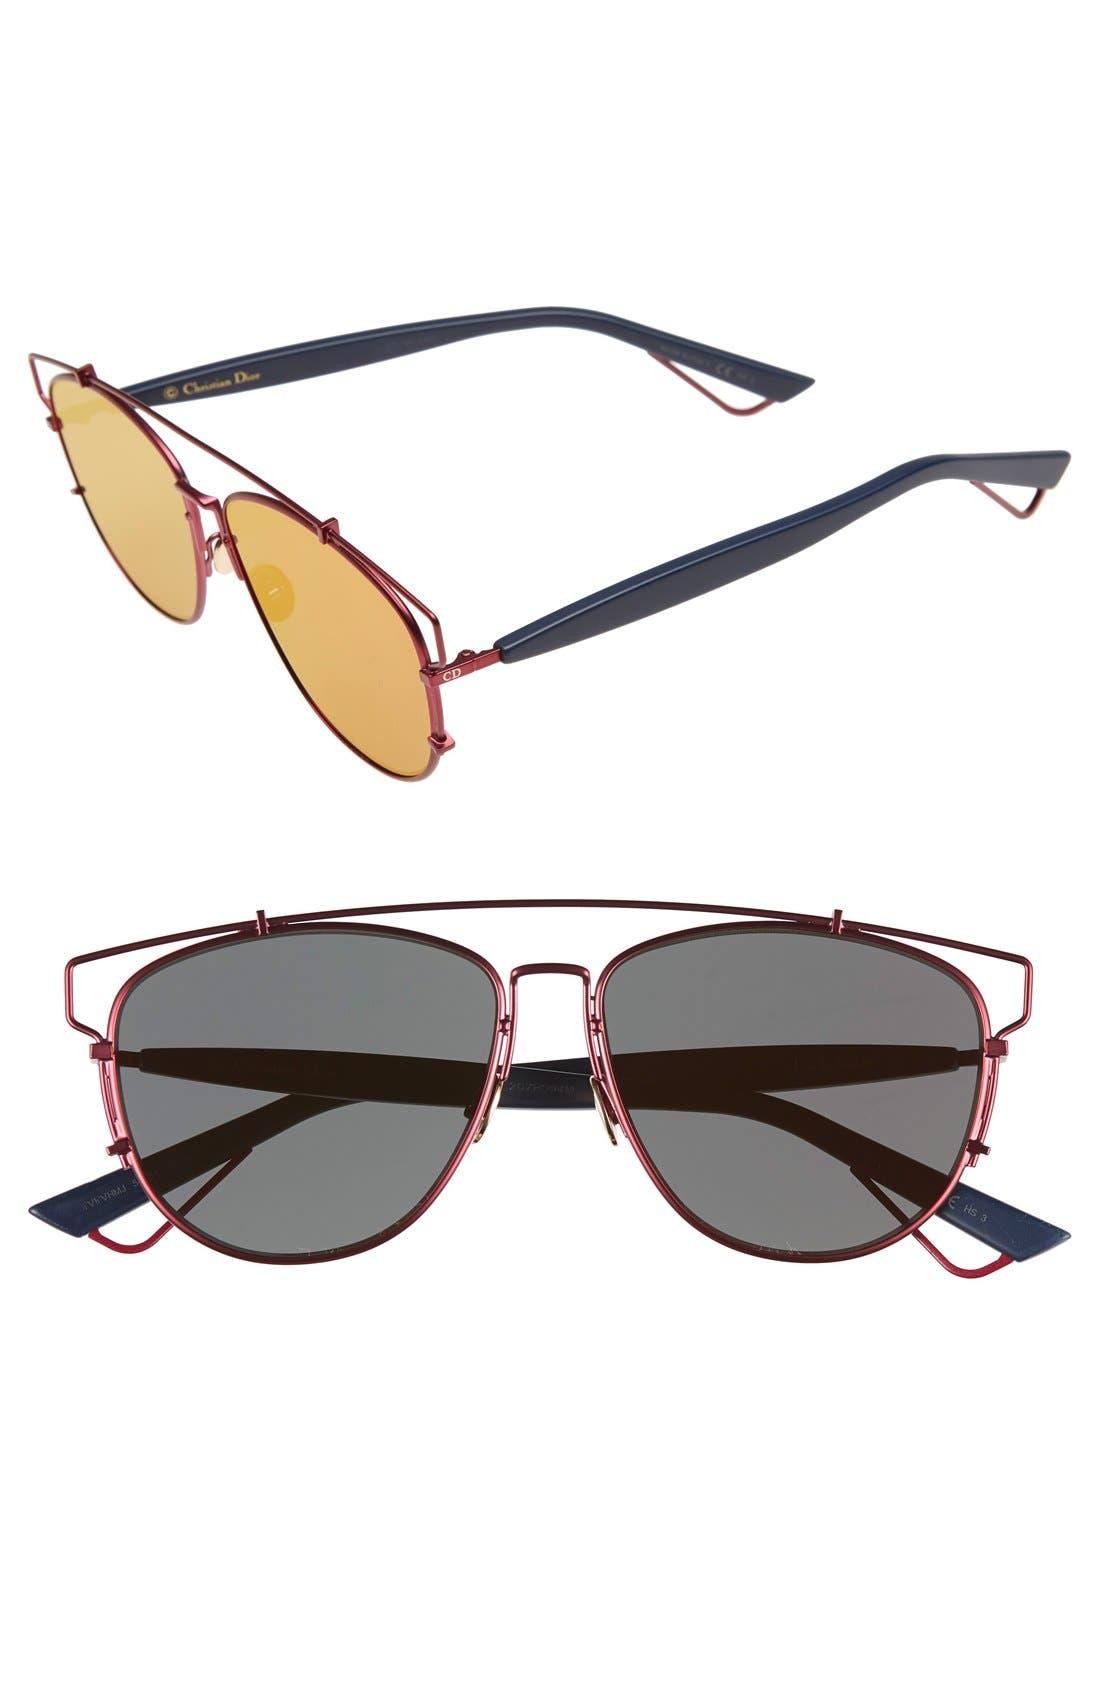 Technologic 57mm Brow Bar Sunglasses,                             Main thumbnail 11, color,